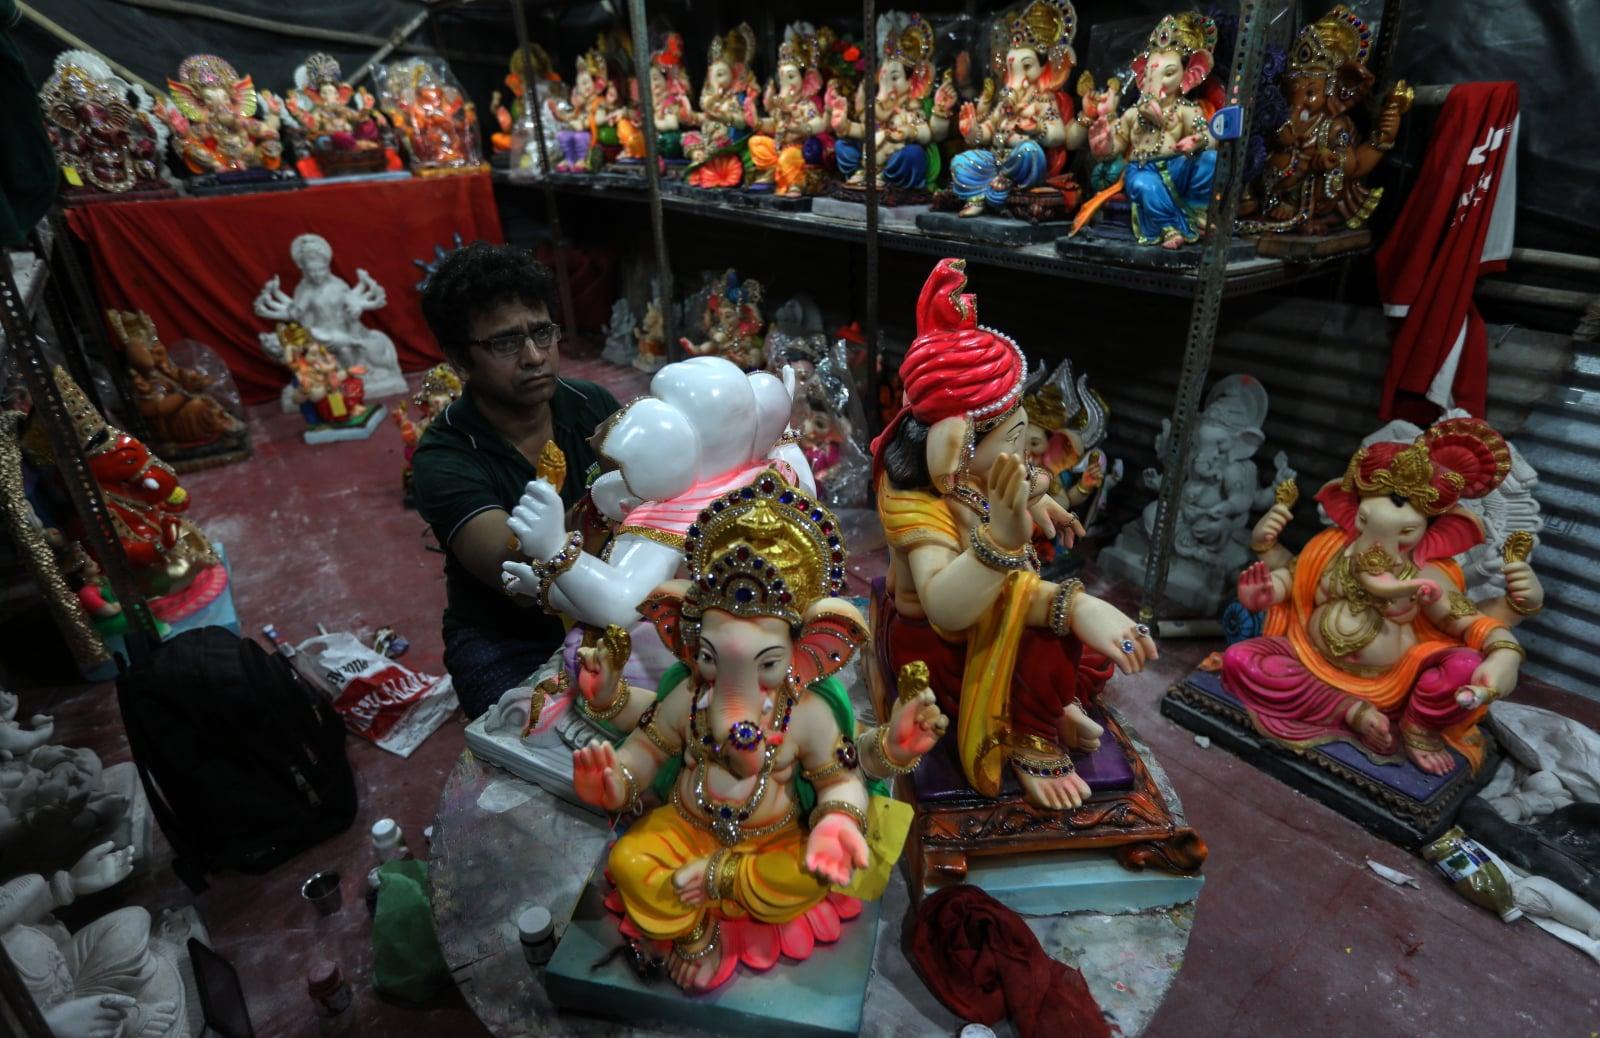 Festiwal Ganesha na ulicach Indii